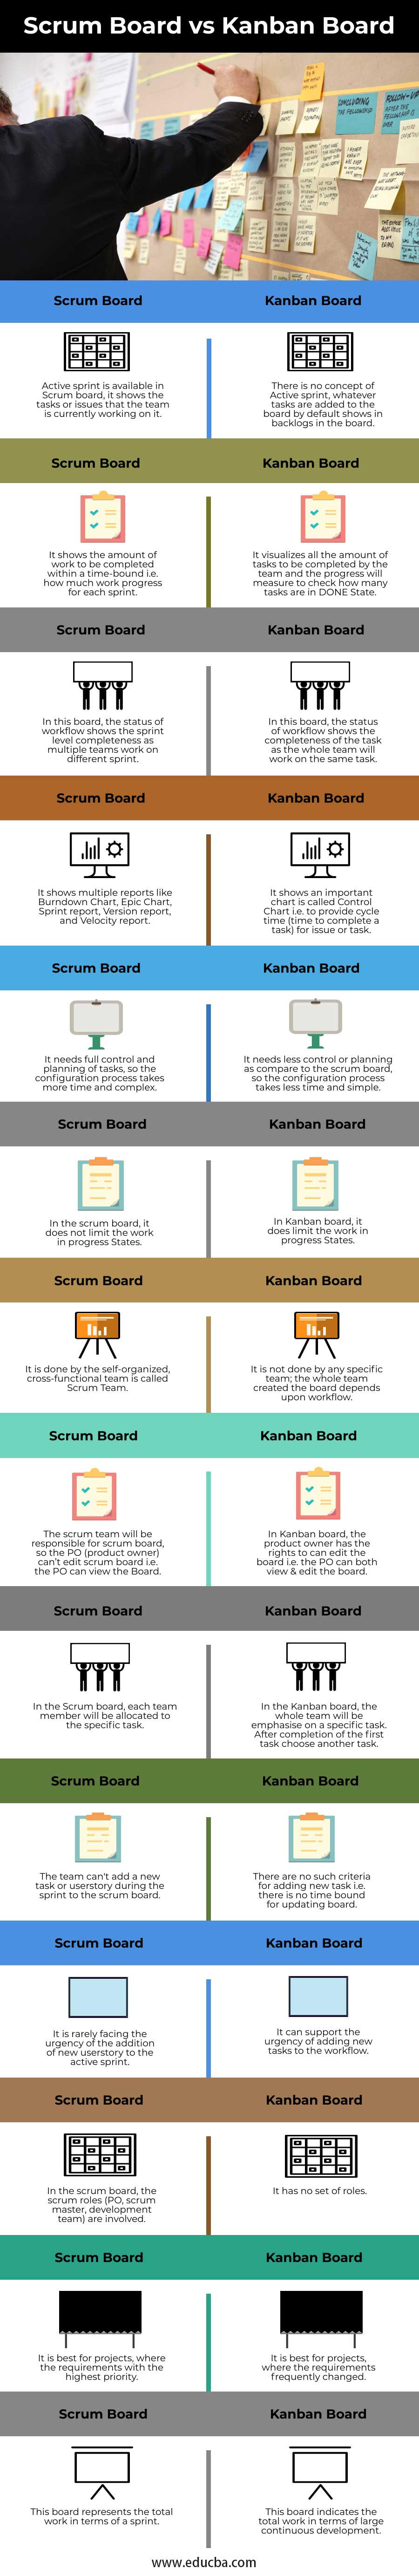 Scrum Board vs Kanban Board Info